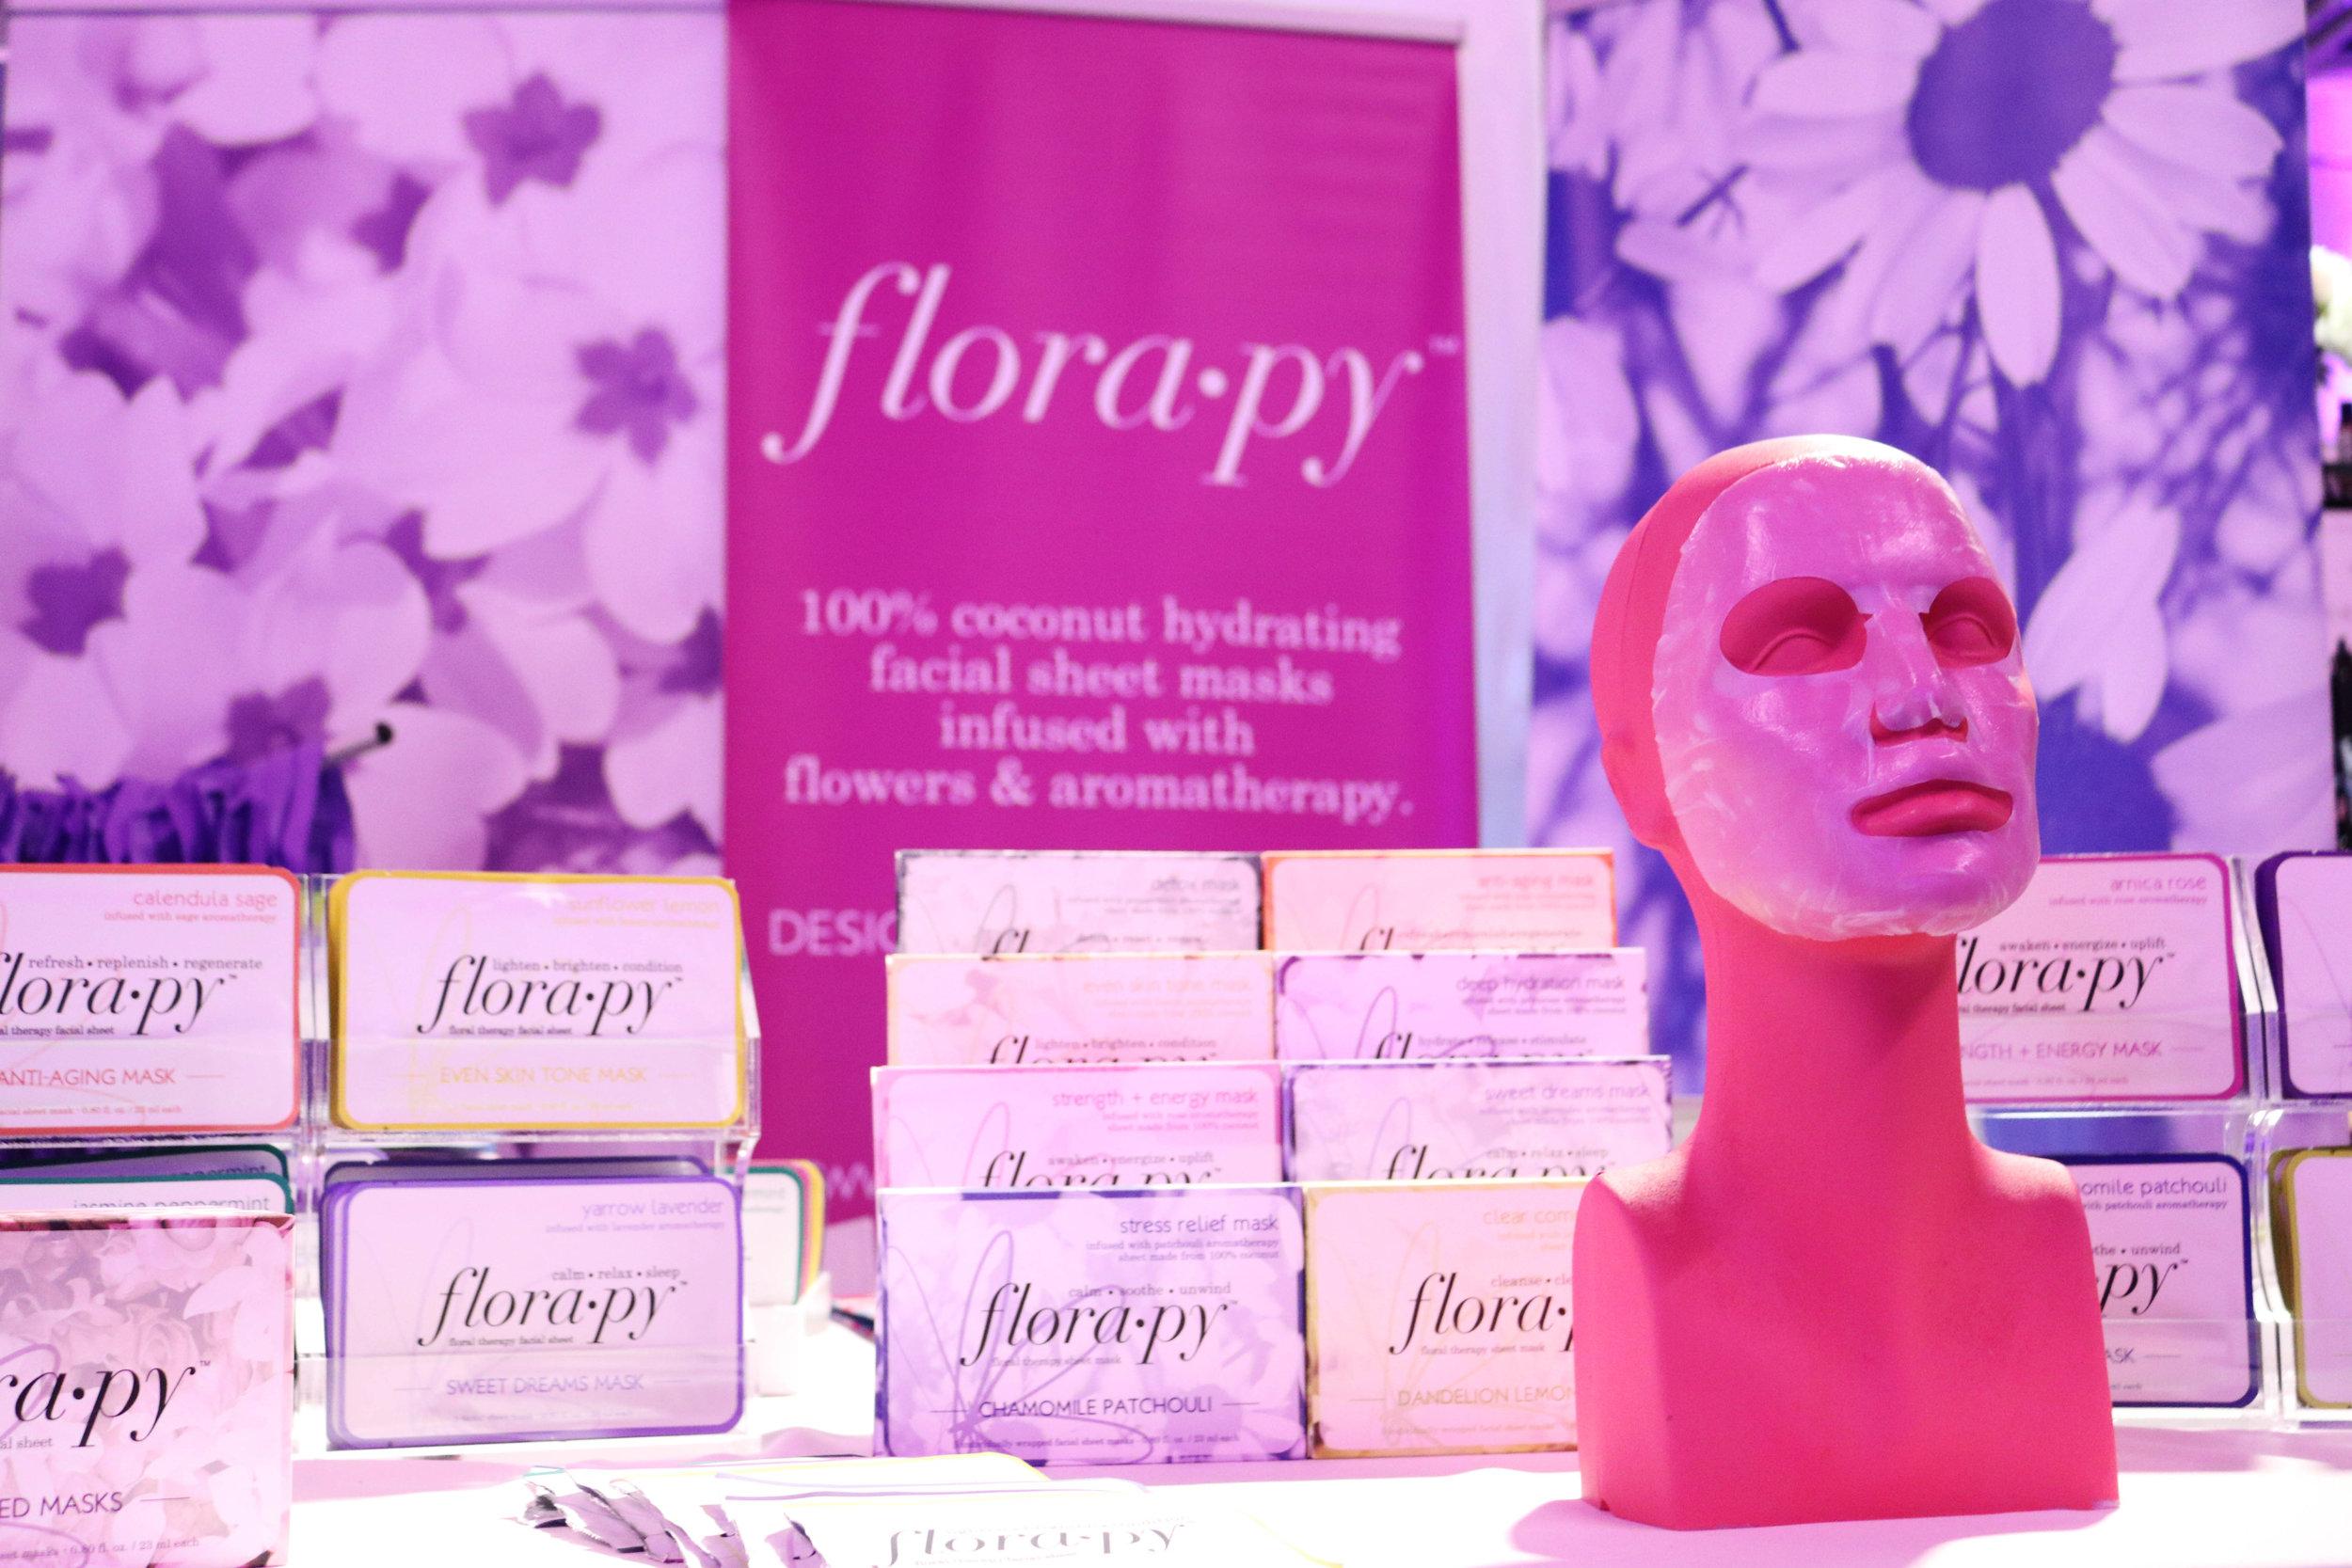 Flora•py